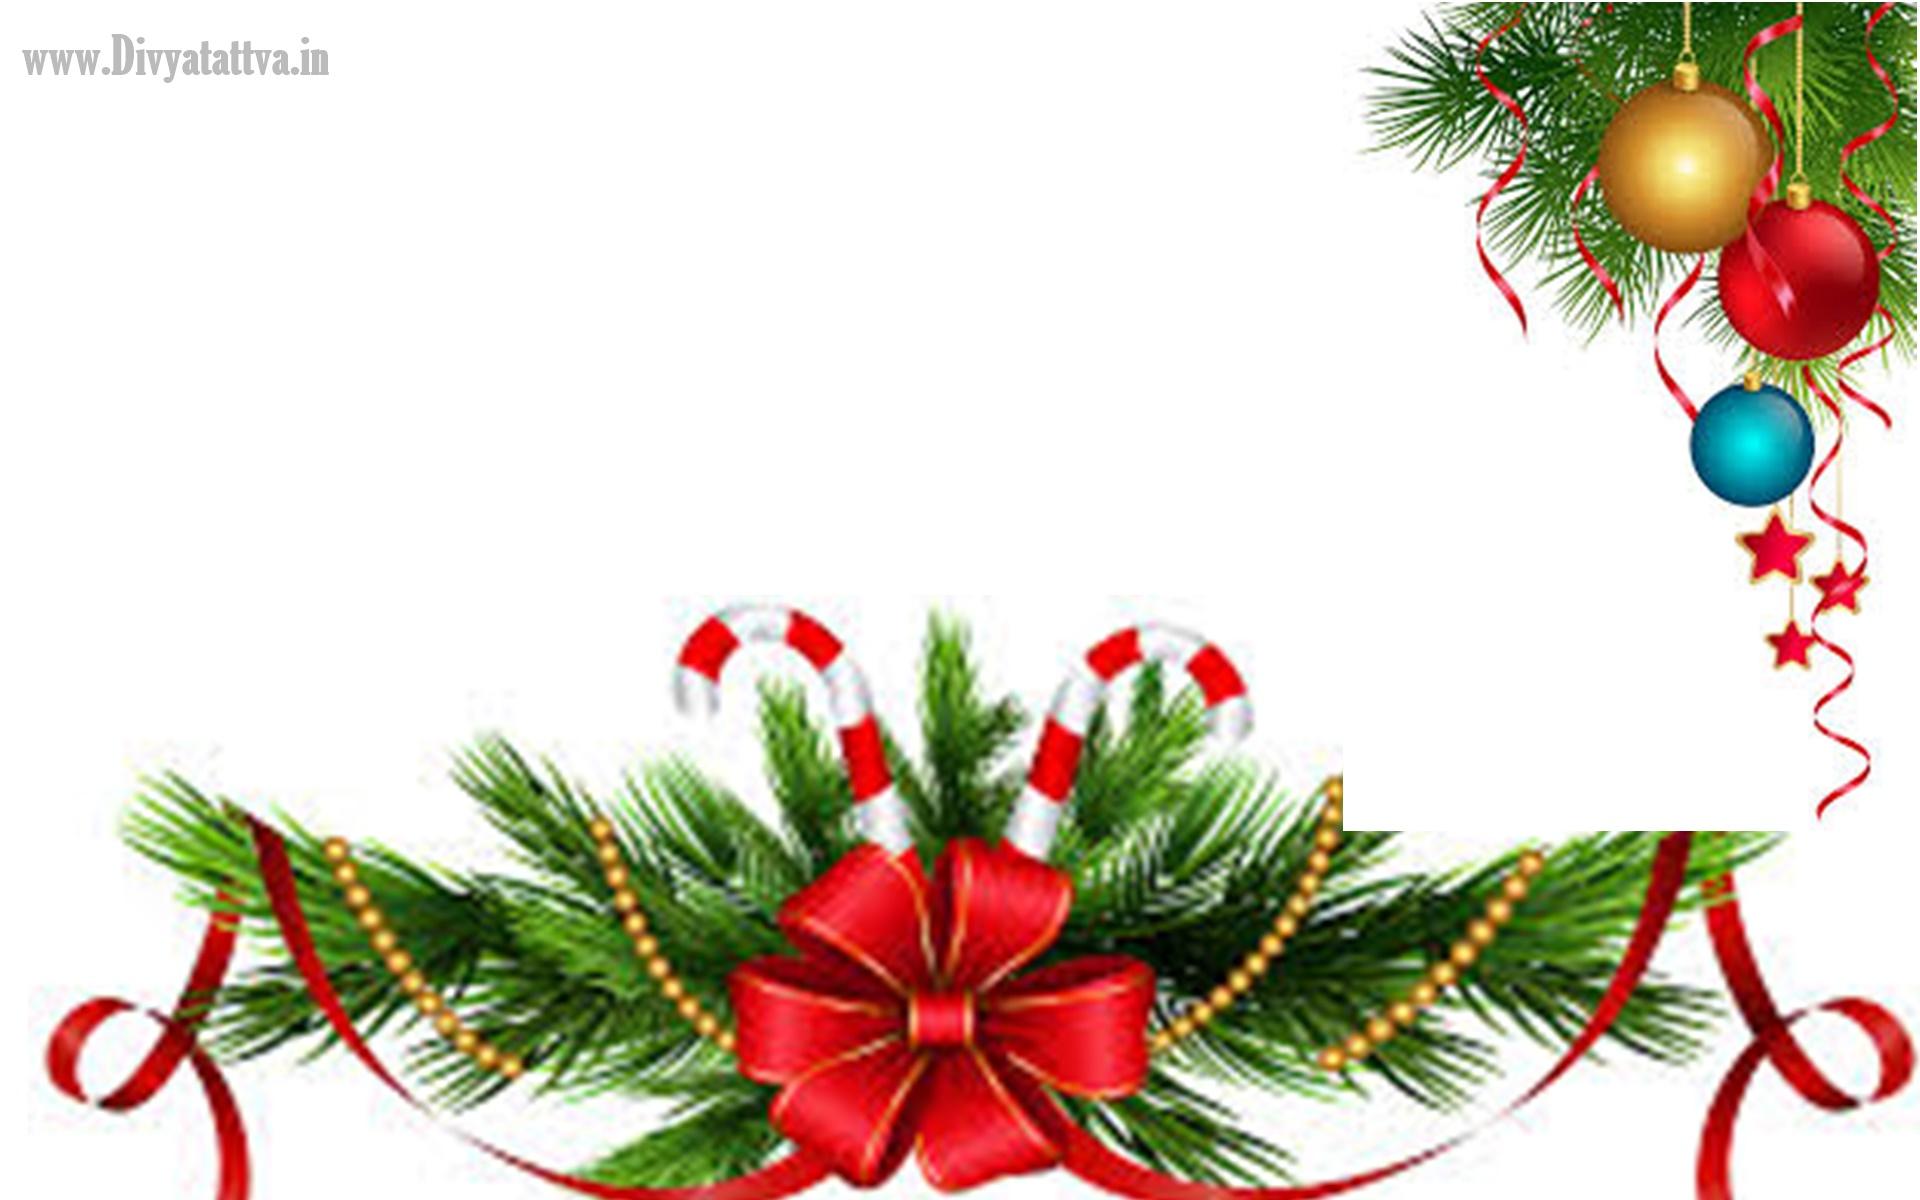 christmas wallpaper 4k iphone, christmas tree wallpaper 4k,  christmas wallpaper hd, christmas wallpaper download